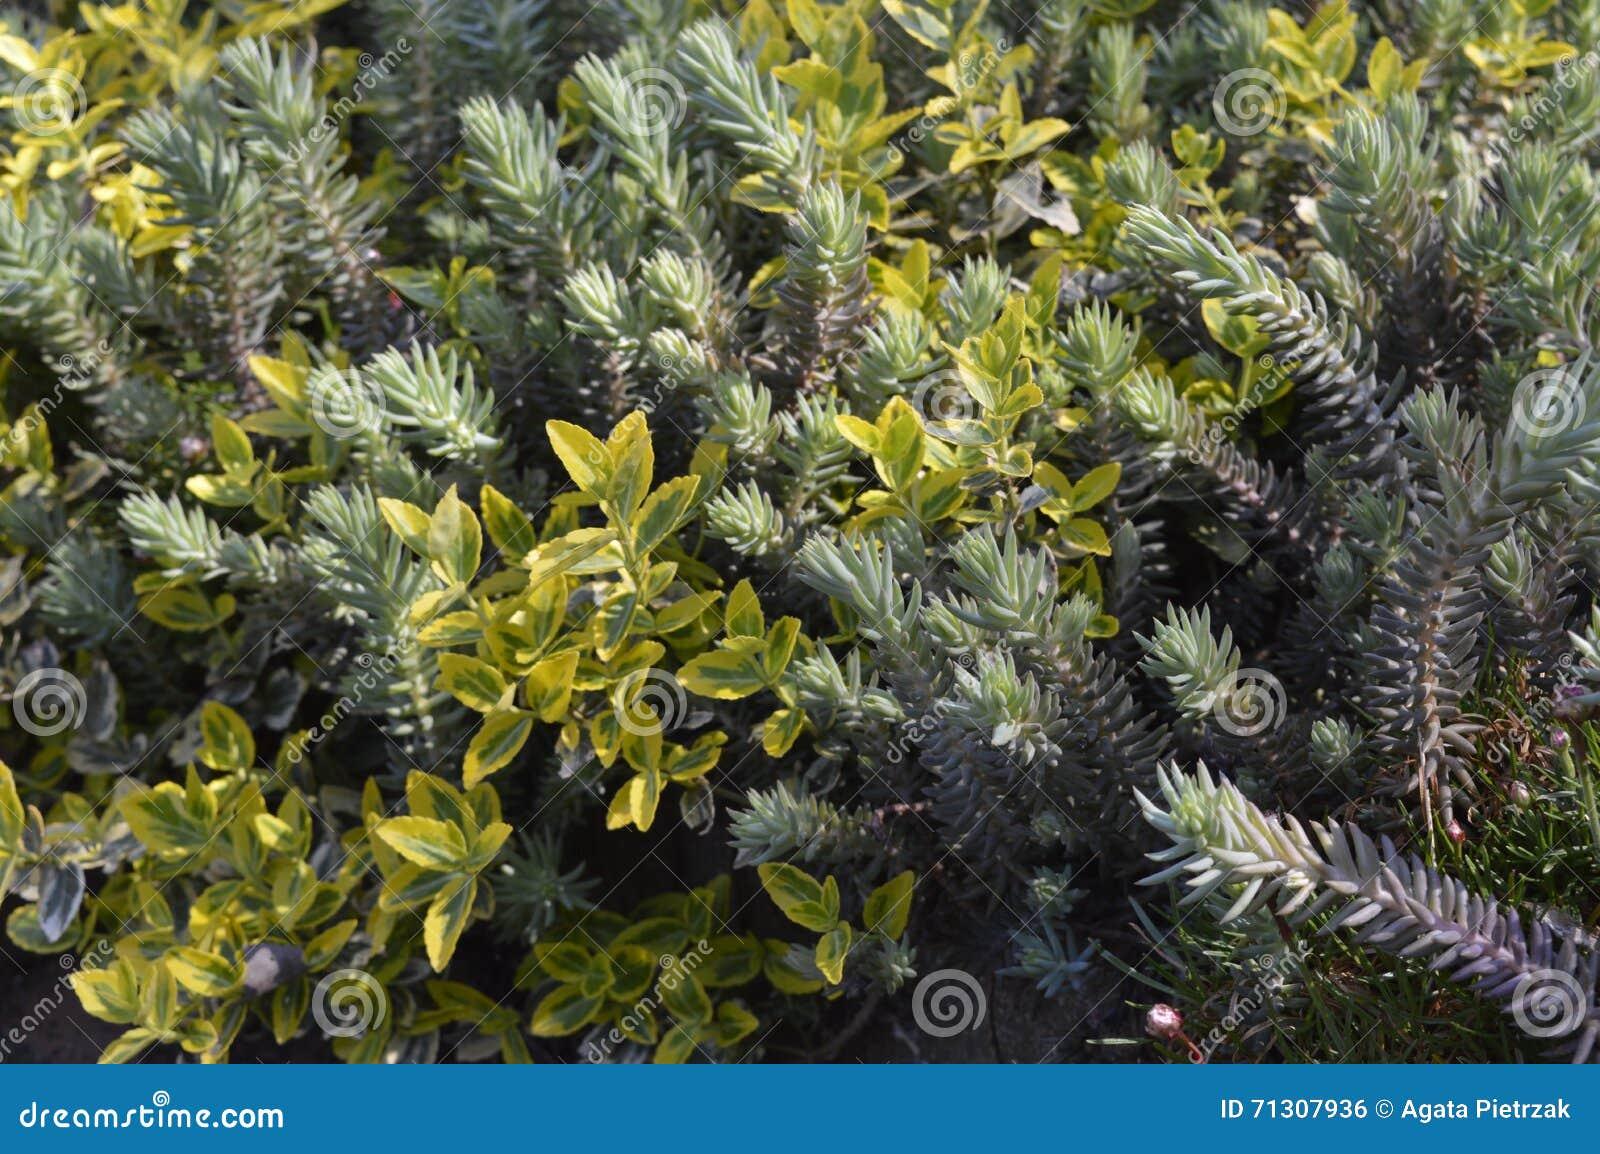 Mistura de plantas verdes e de arbustos